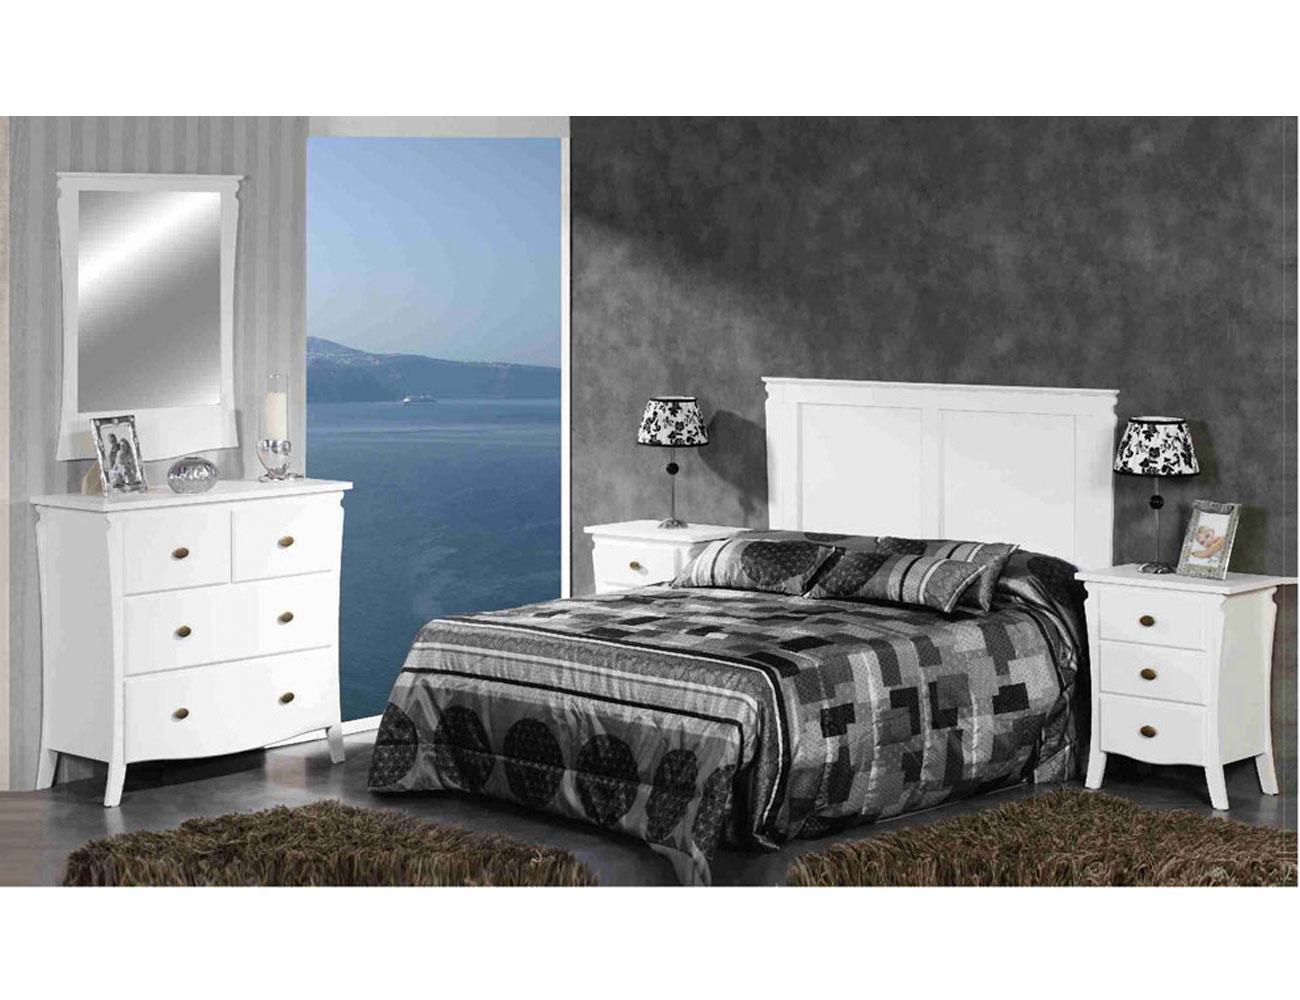 Dormitorio matrimonio blanco lacado madera dm3